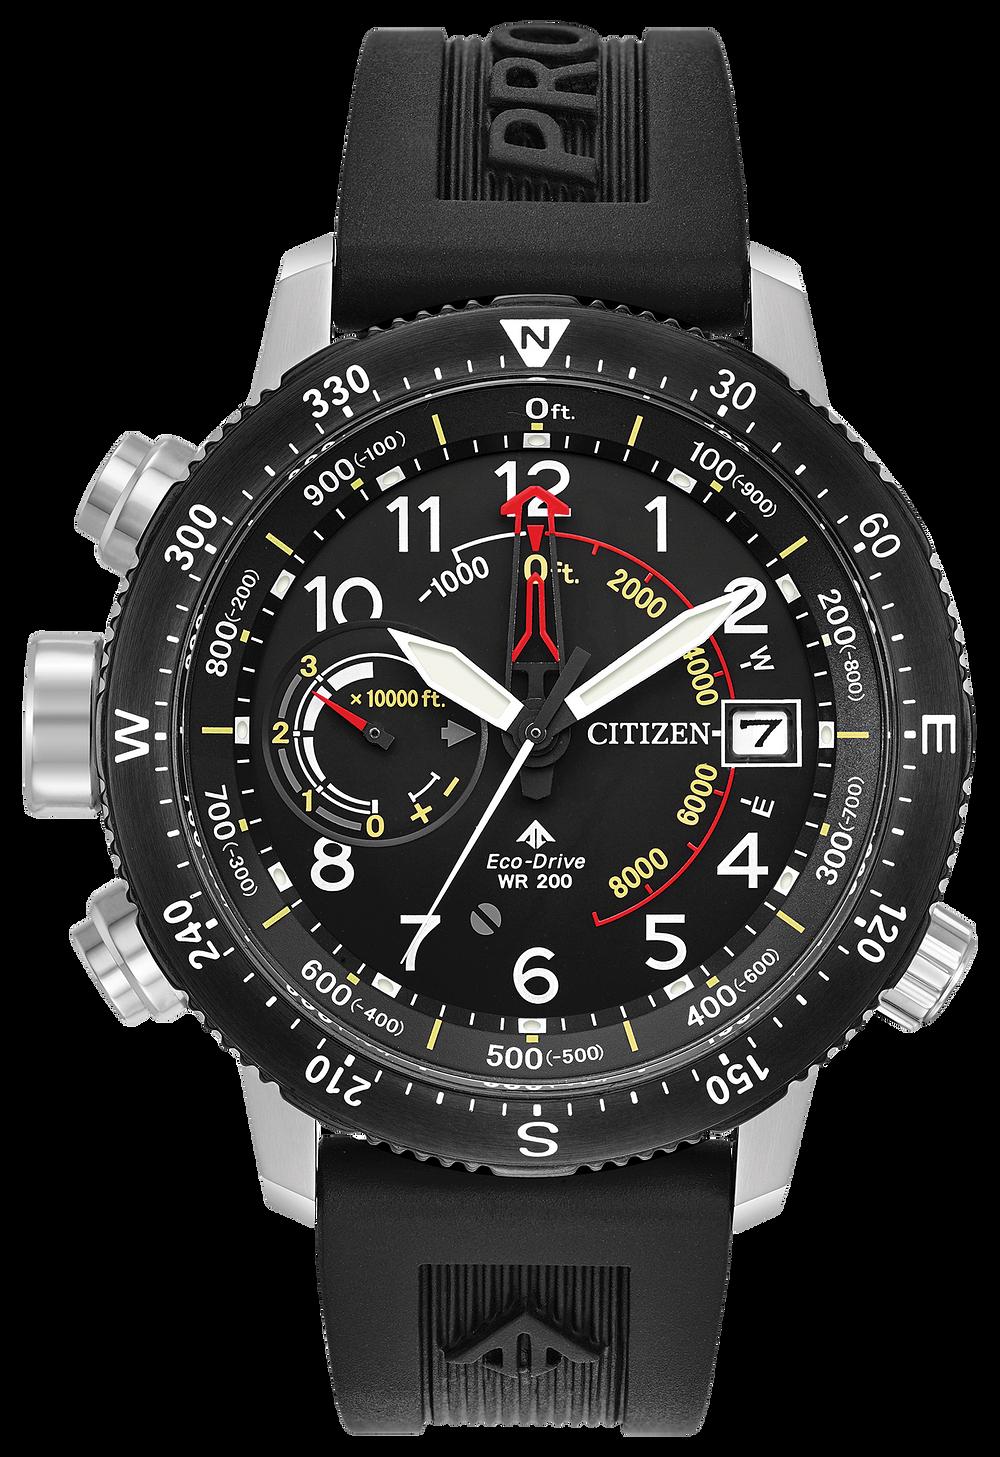 7fe810251 Promaster Altichron - Men's Black BN5058-07E Sports Watch | Citizen